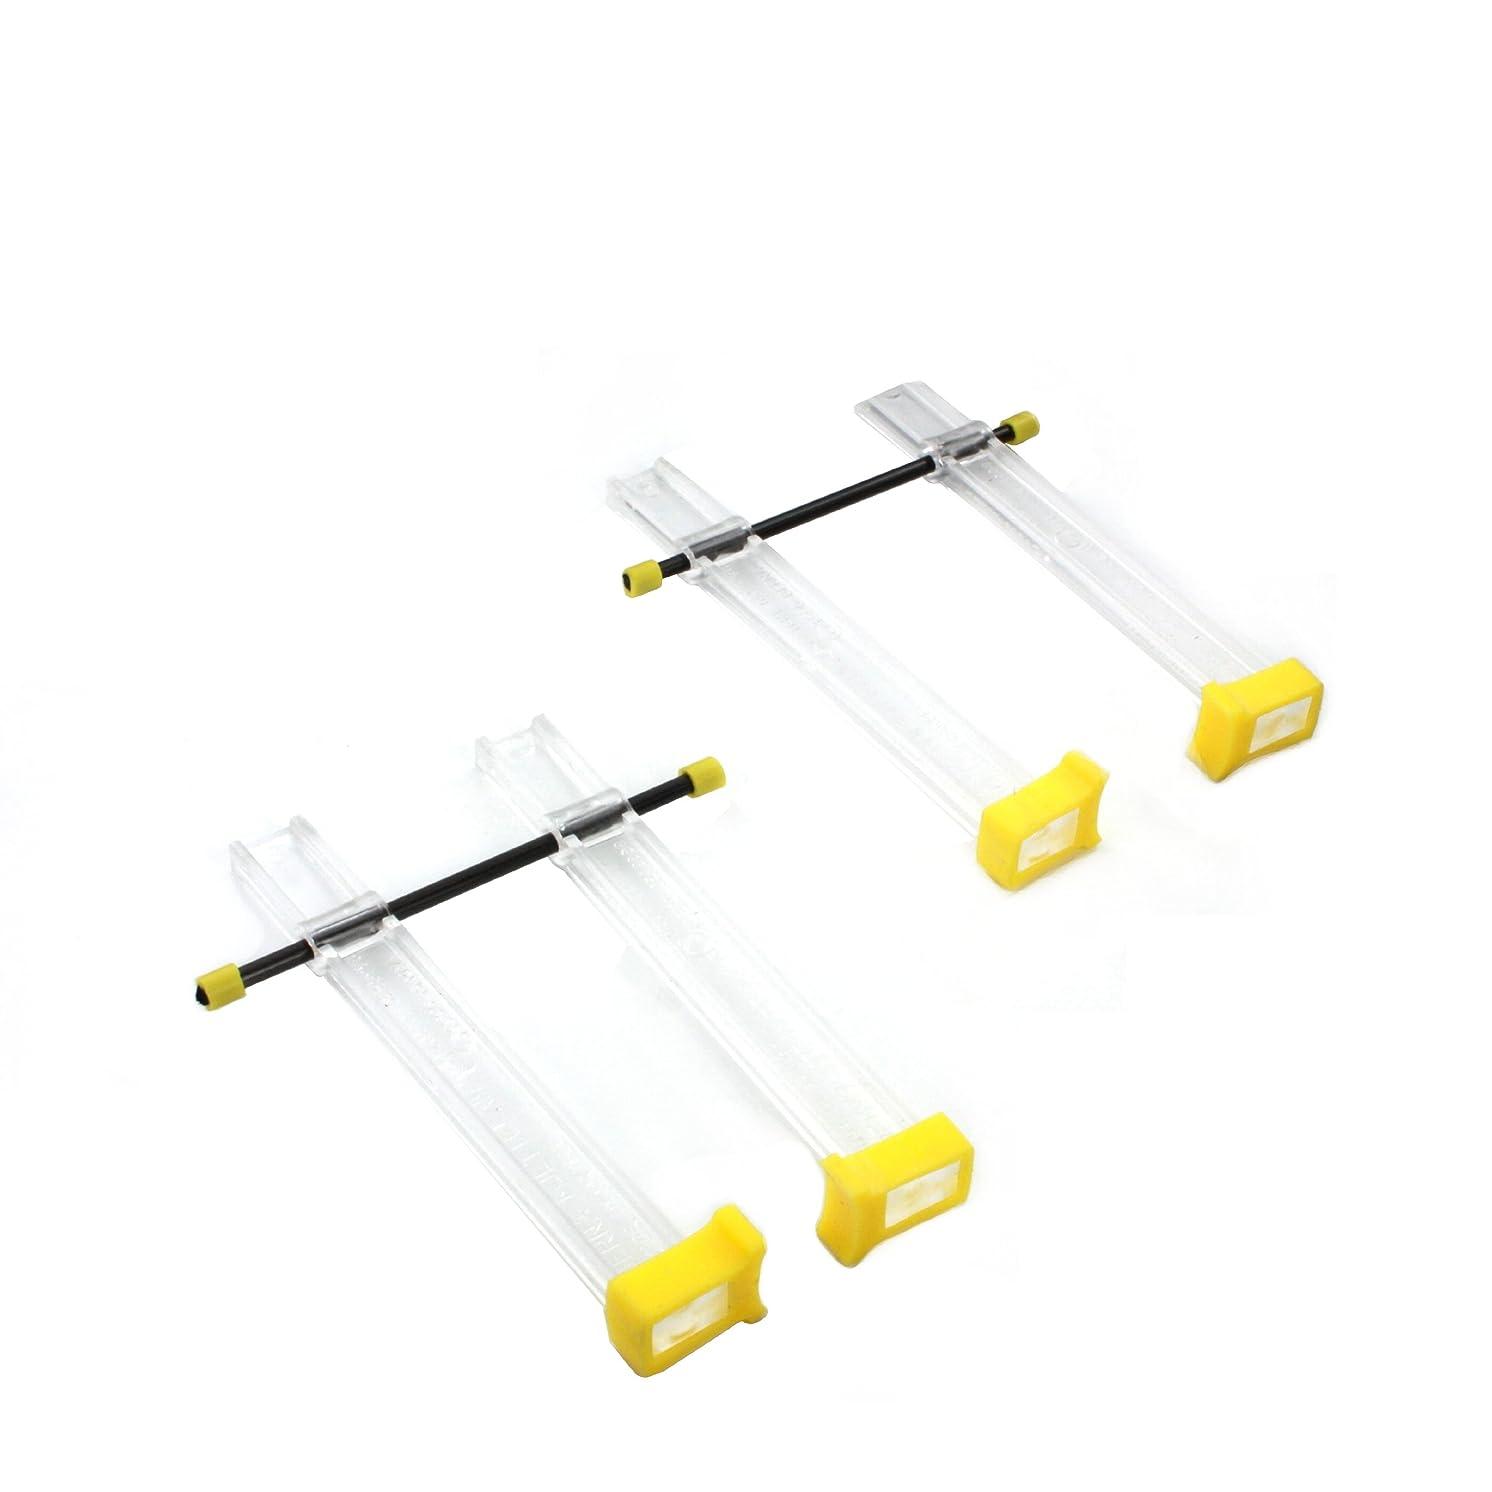 2x 80mm Berna Multiclamps Clamp Holder Vice Professional Craft Diy Tool